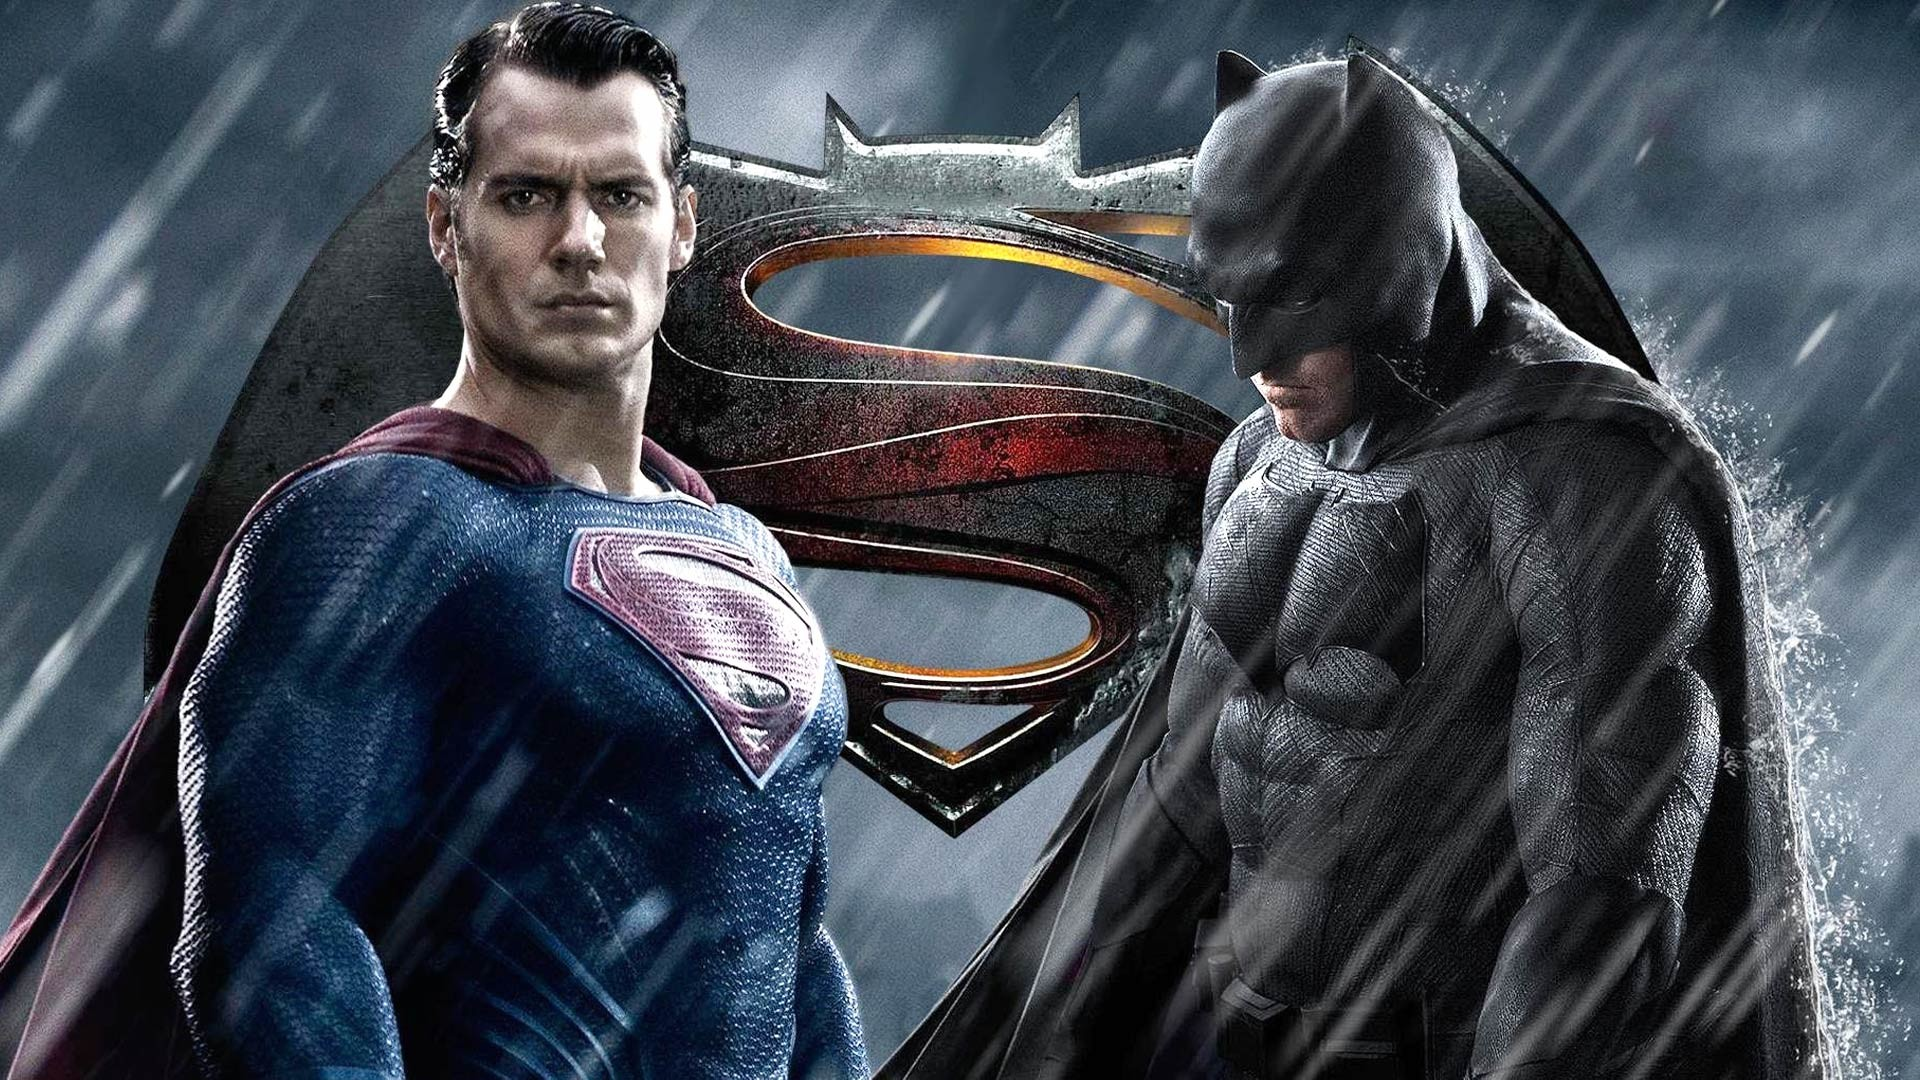 batman superman wallpapers 1080p 35695poster.jpg